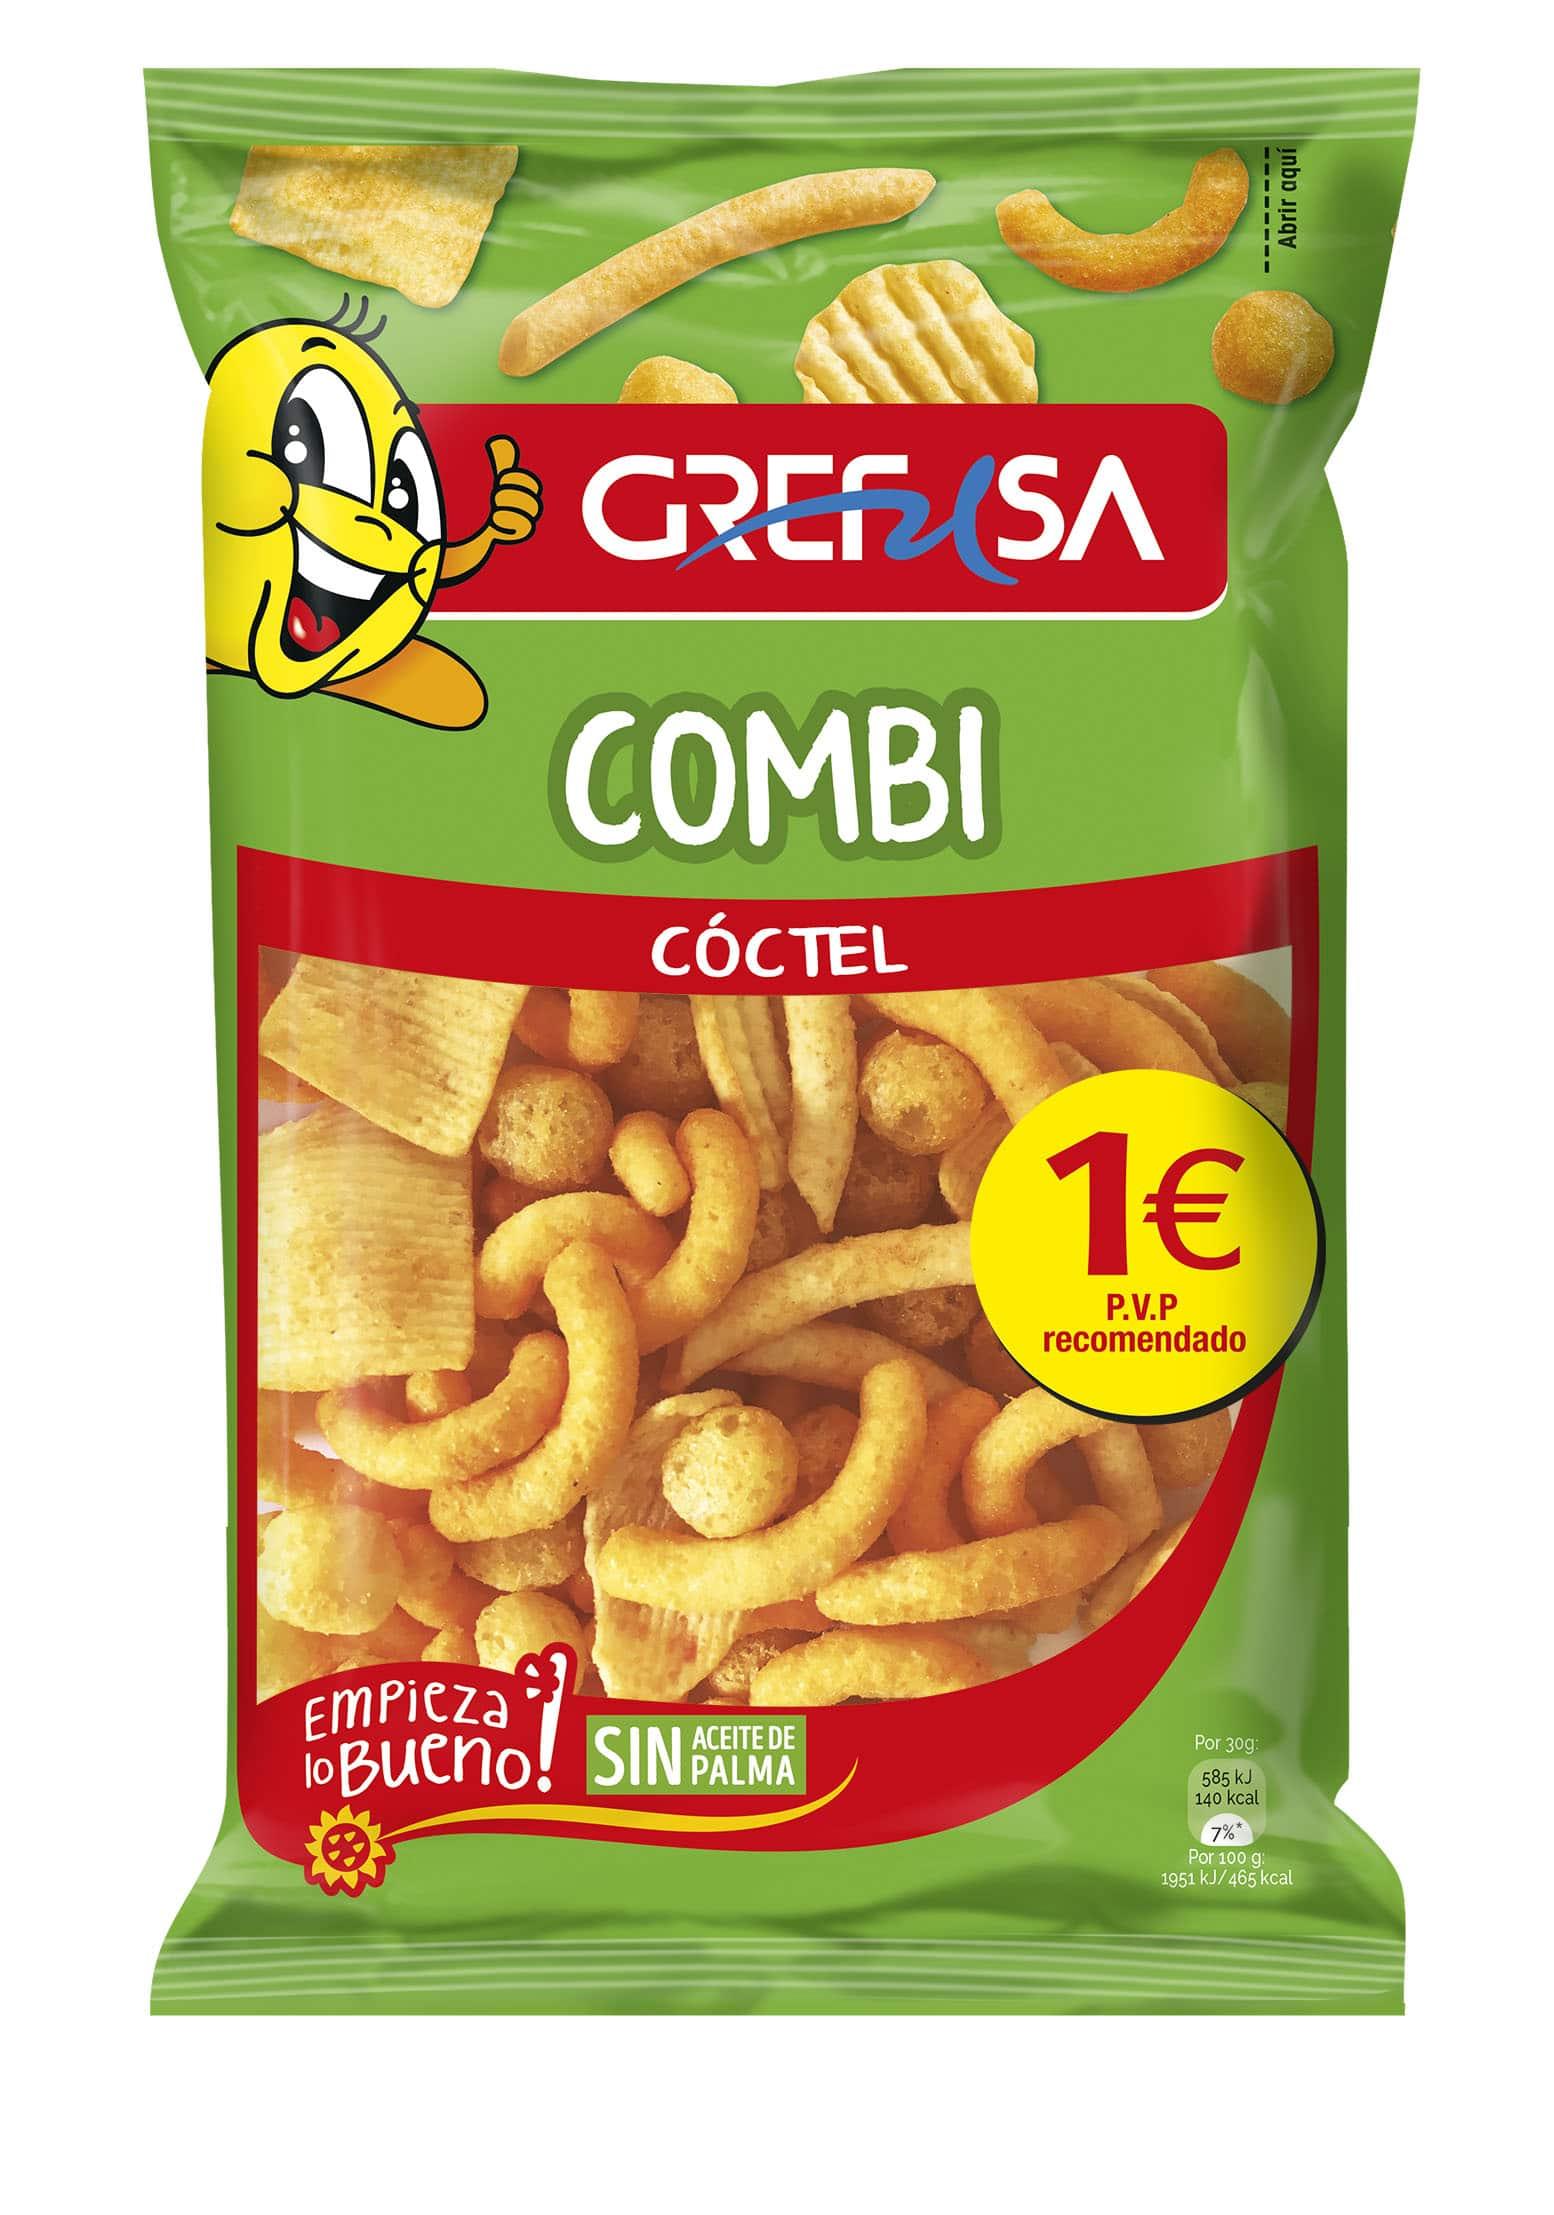 grefusa combi coctel